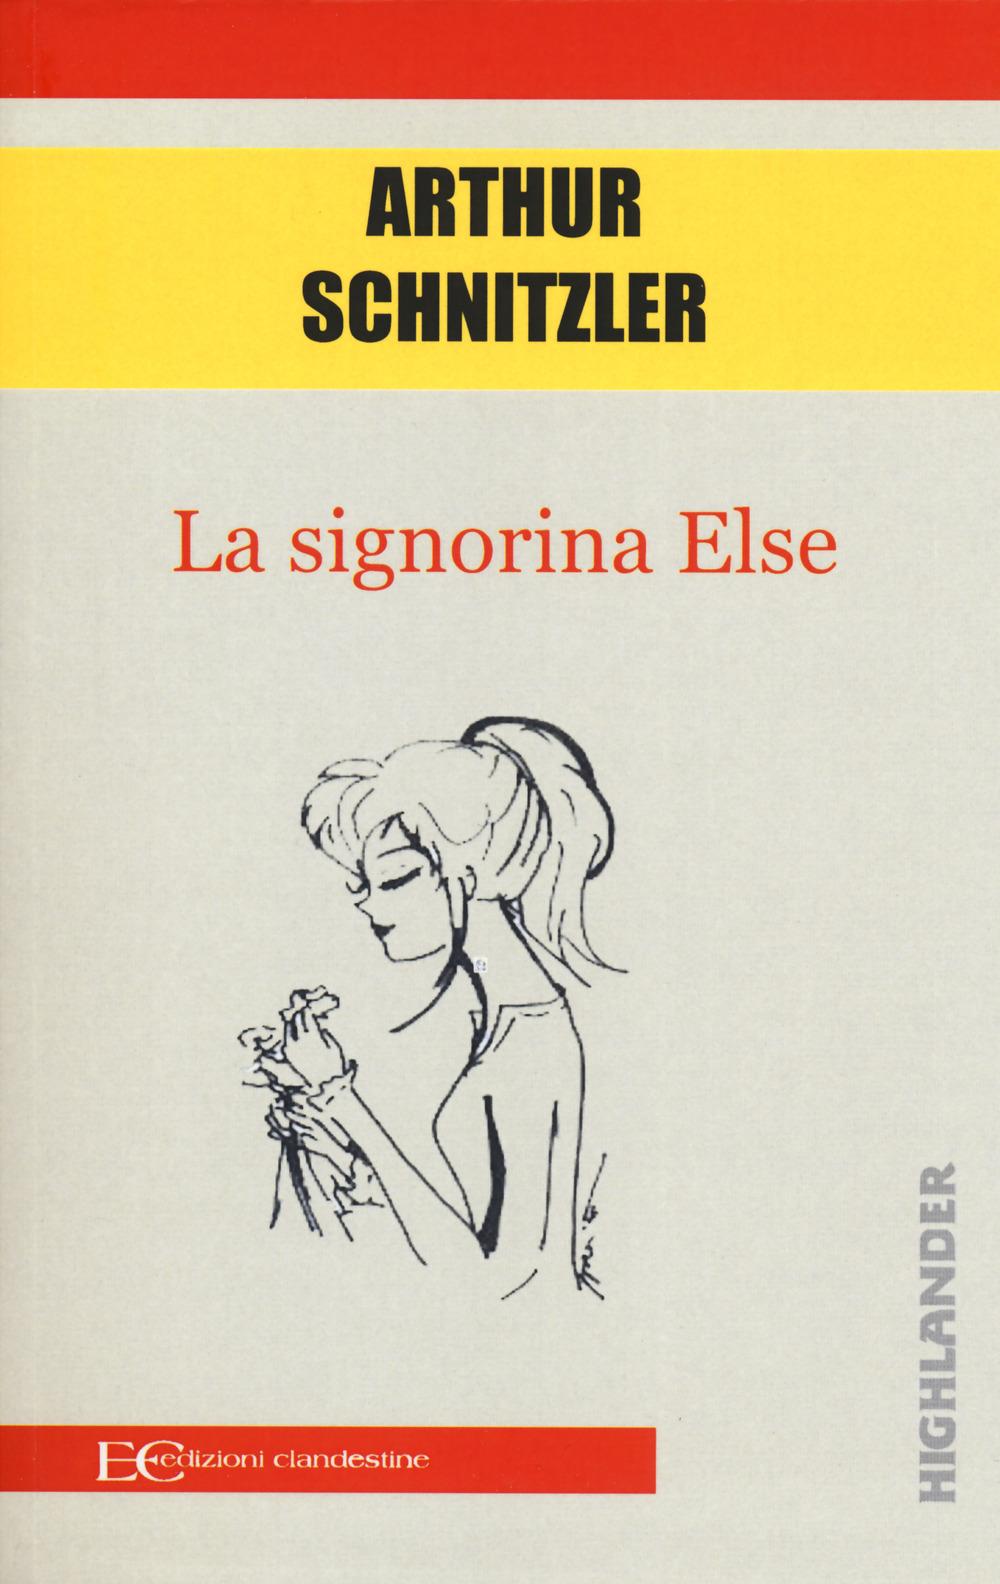 SIGNORINA ELSE (LA) - Schnitzler Arthur - 9788865968833